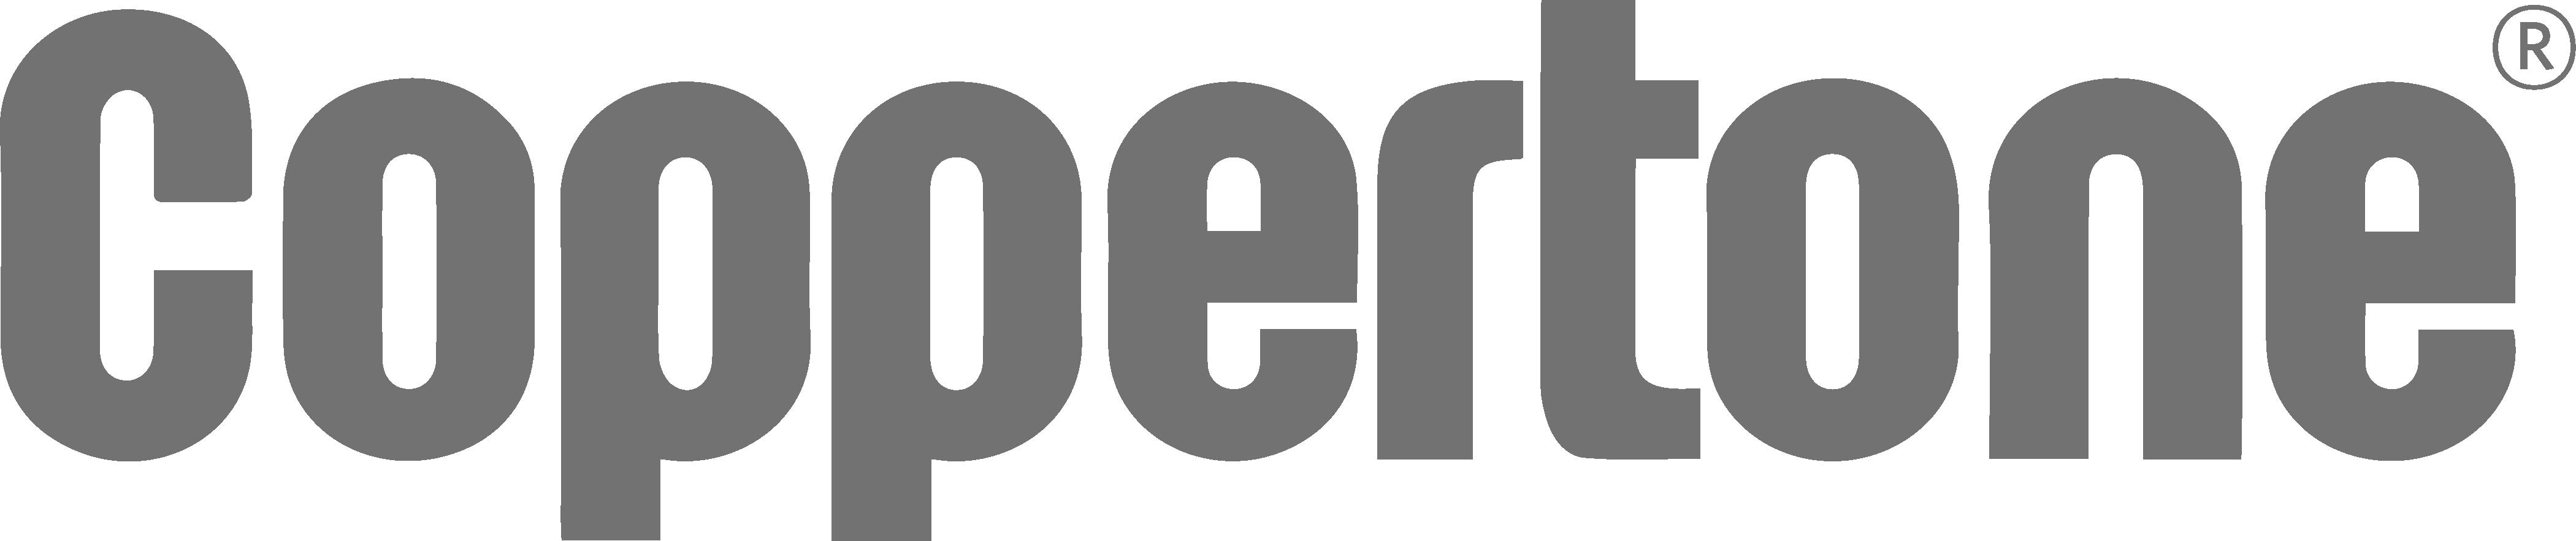 Coopertone Logo